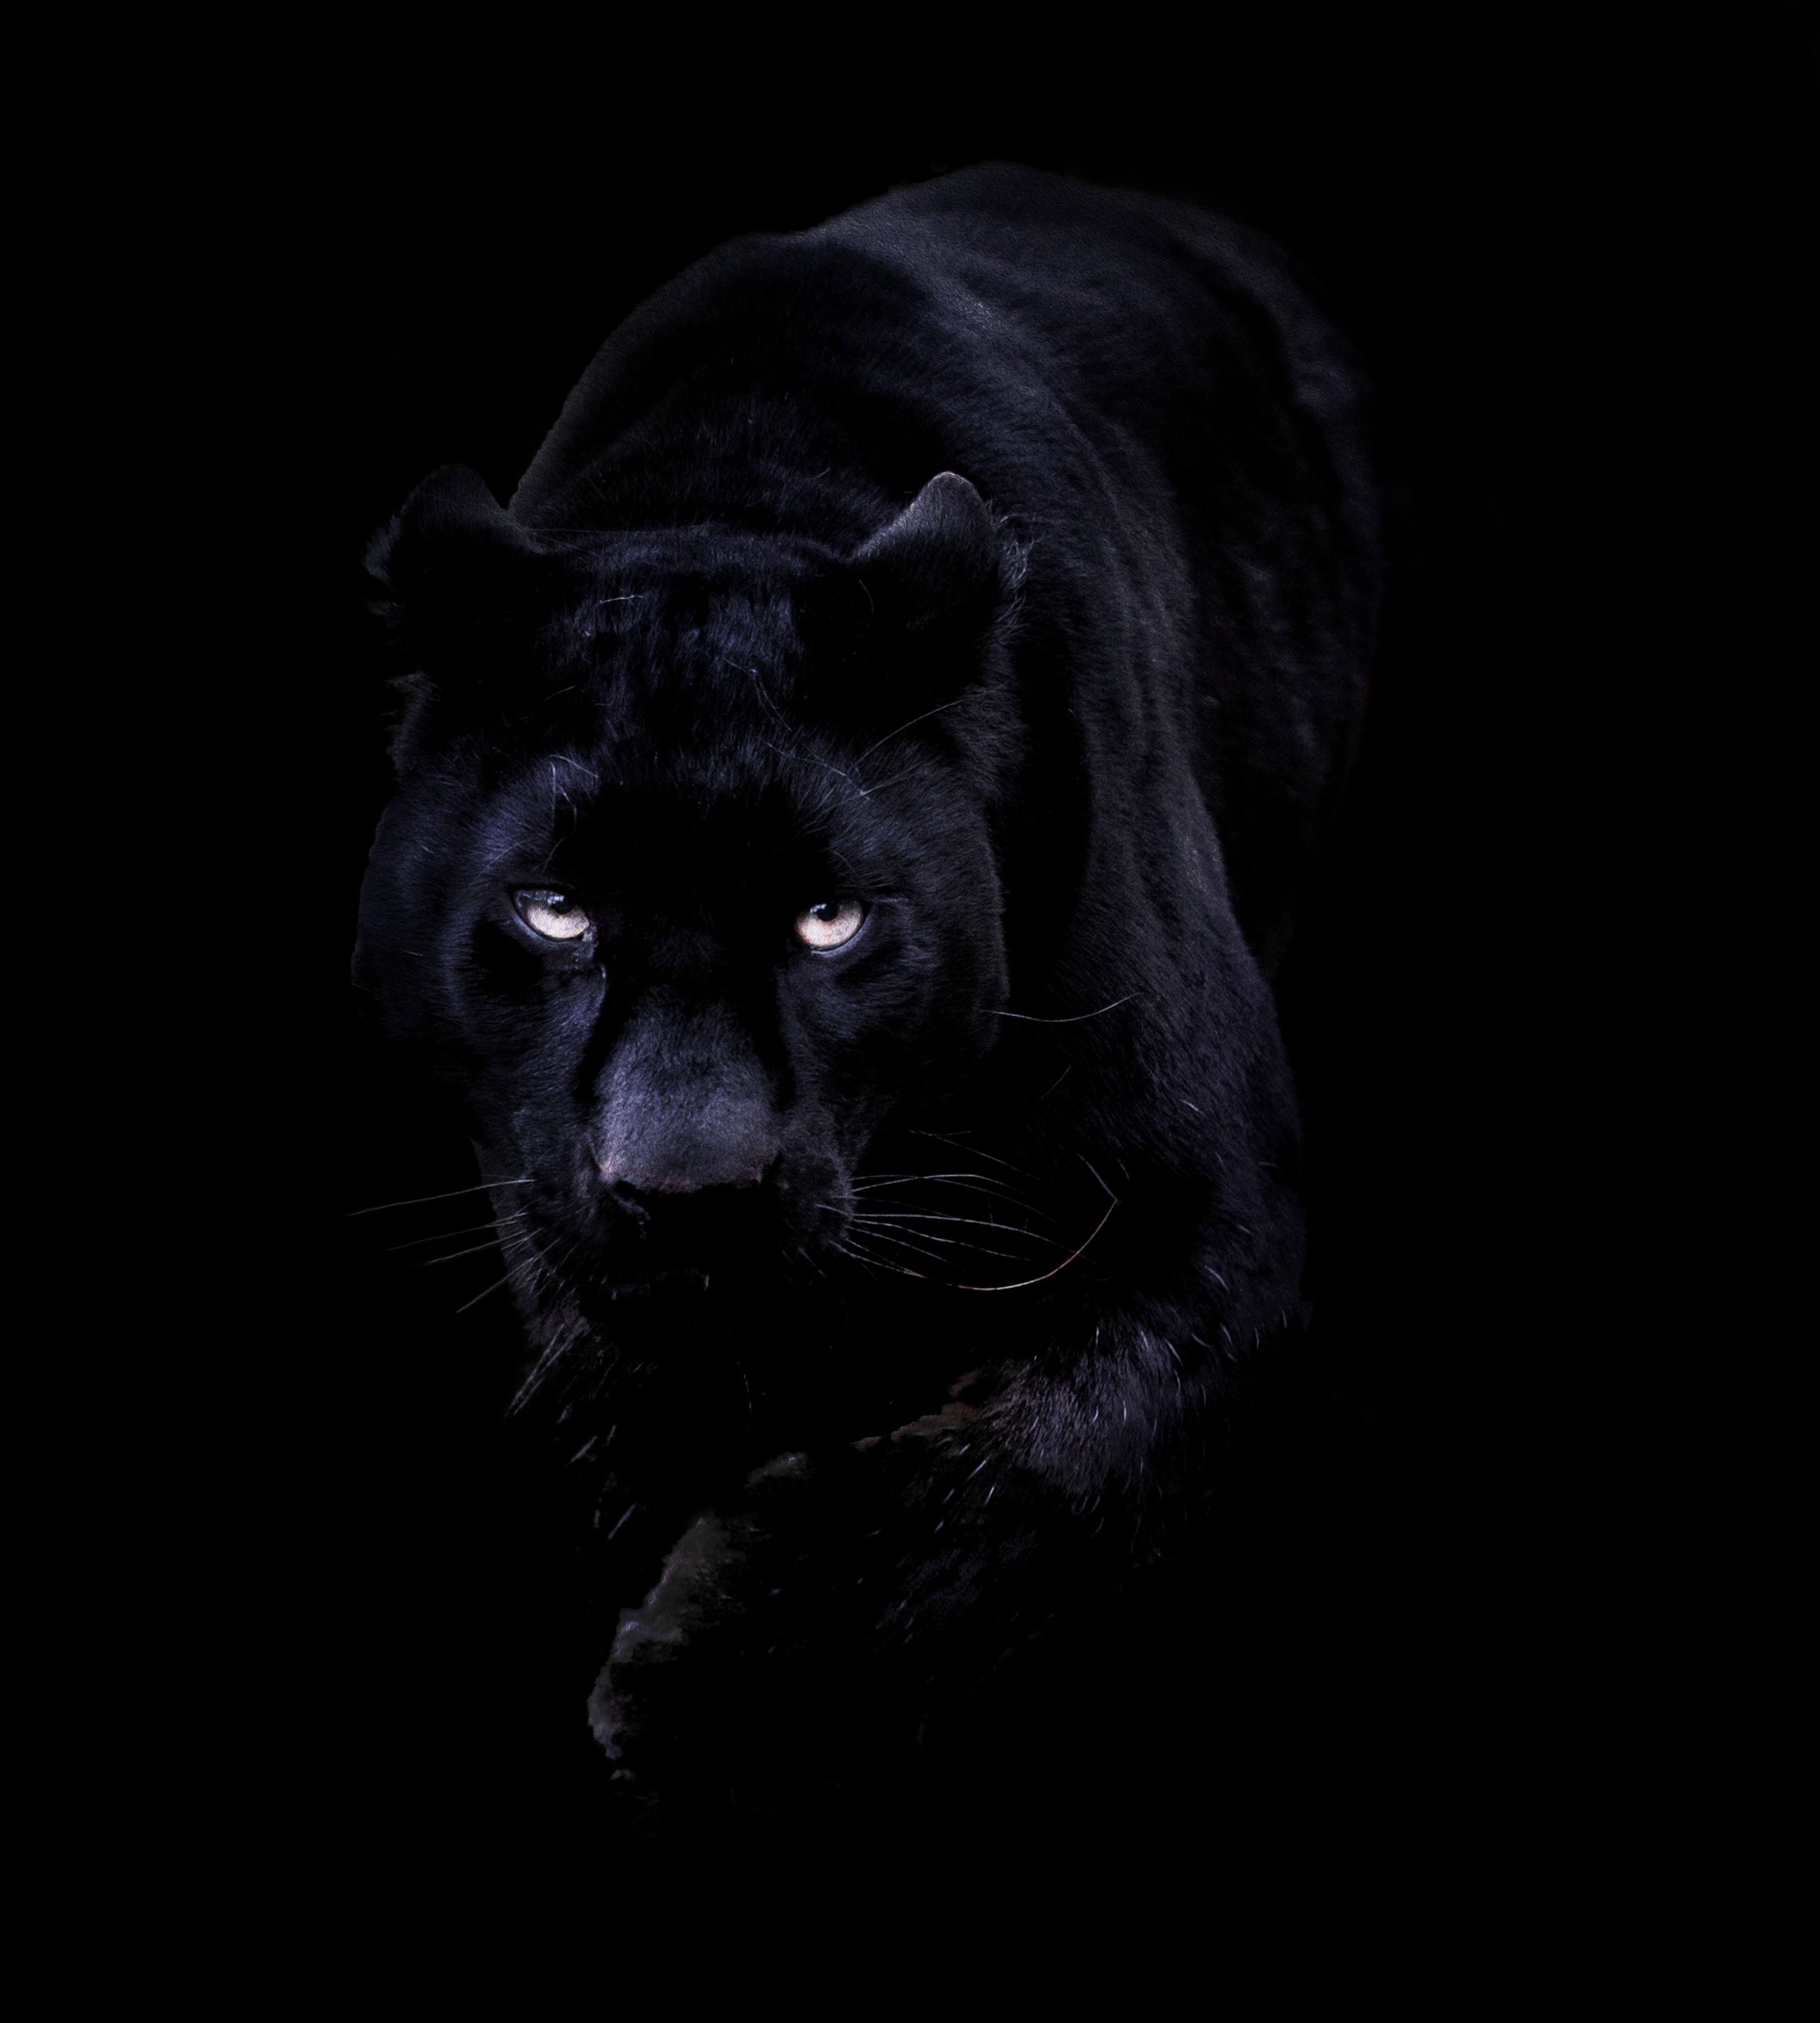 Khan the Black Leopard   Kent England 3860x4290